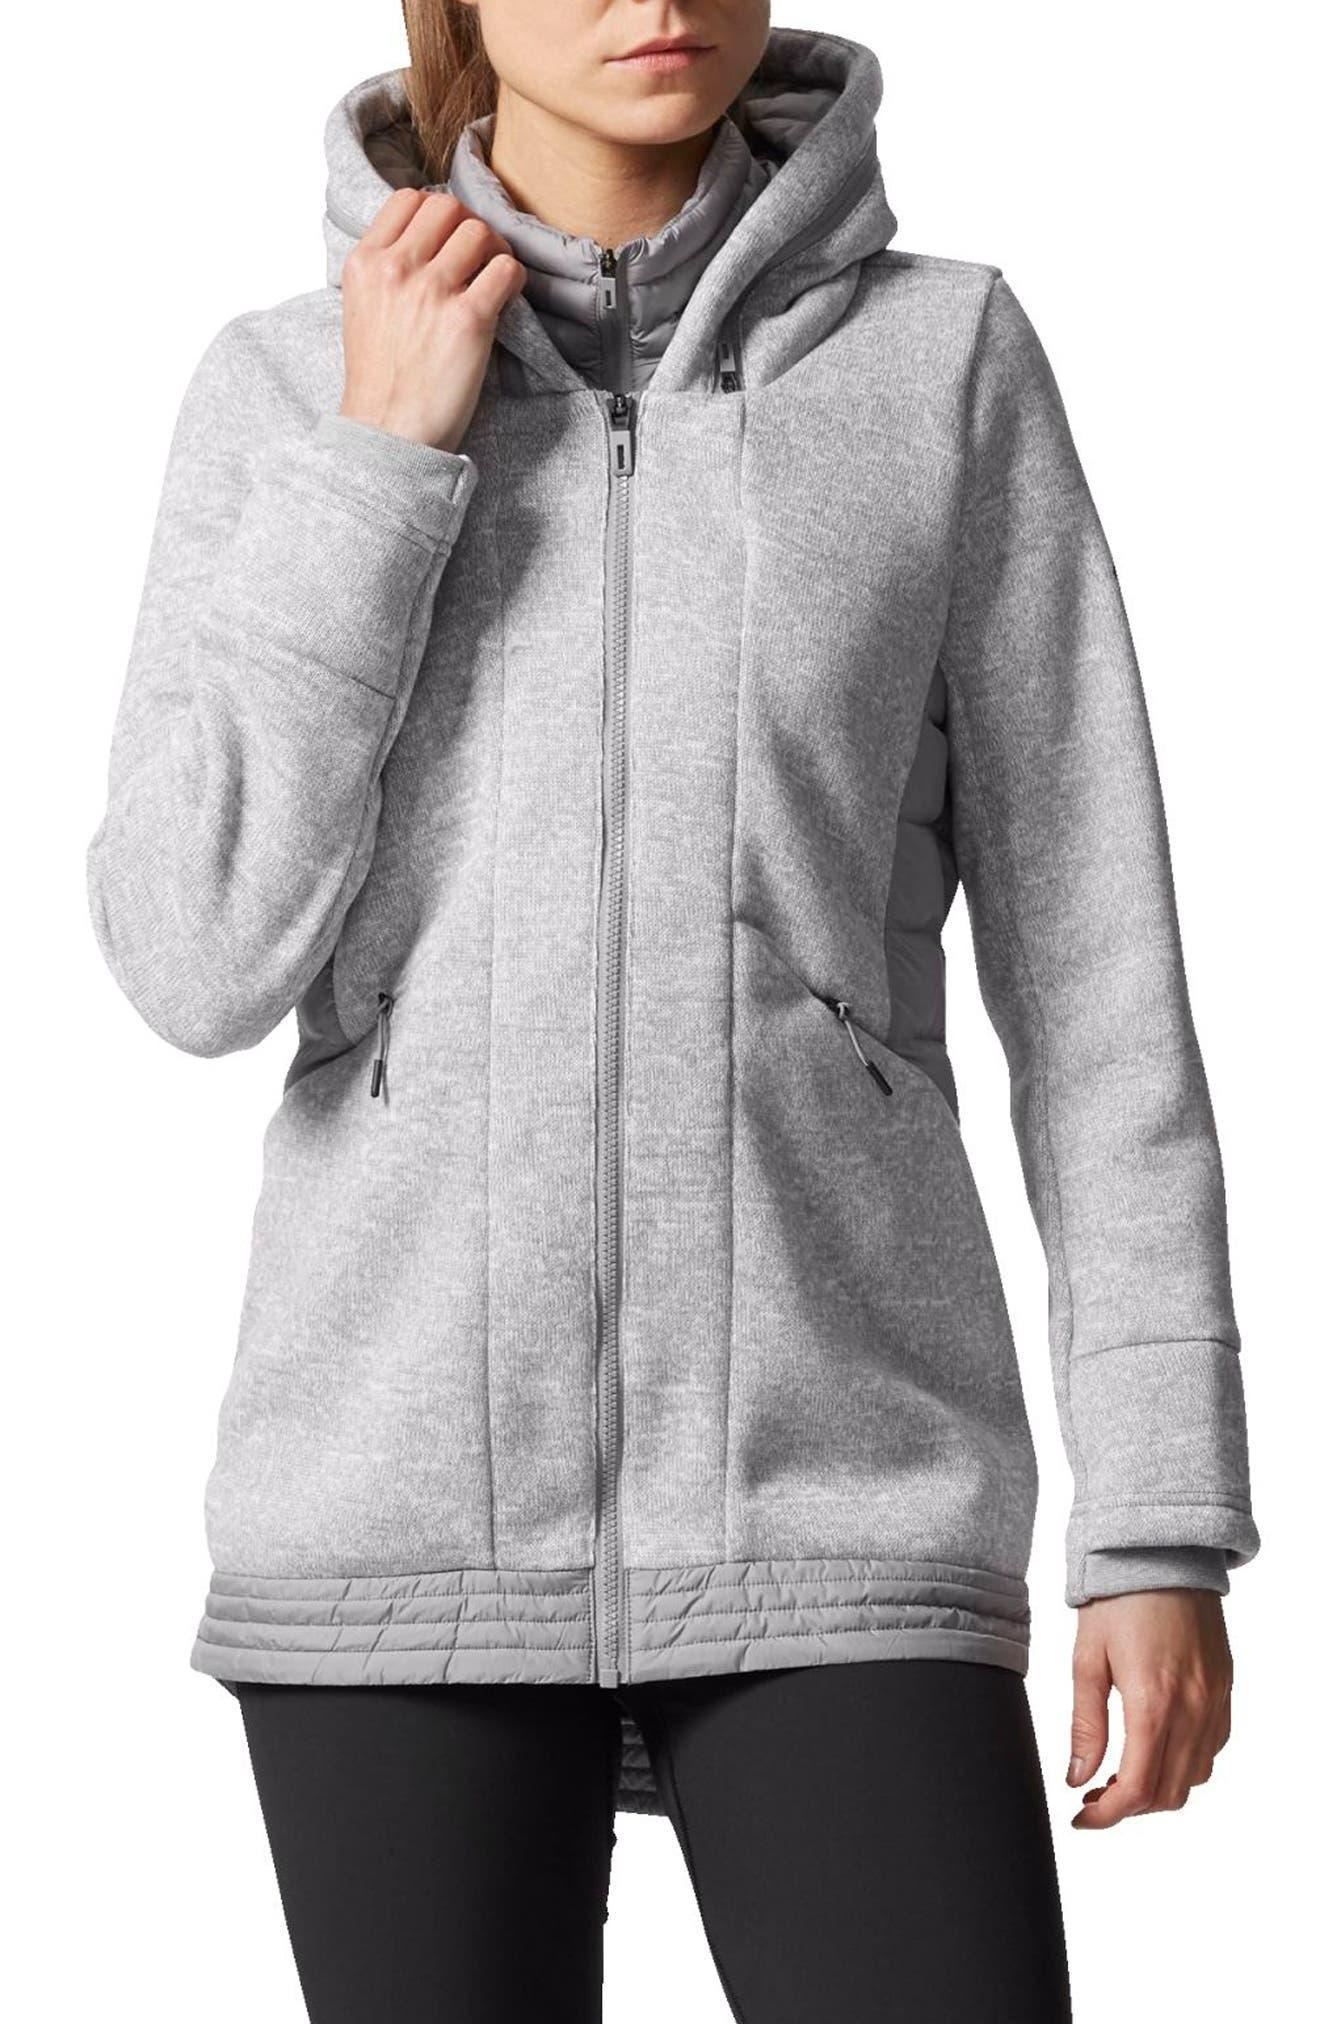 Nuvic Hybrid 2 Fleece/Puffer Jacket,                         Main,                         color, Medium Grey Heather/Solid Grey